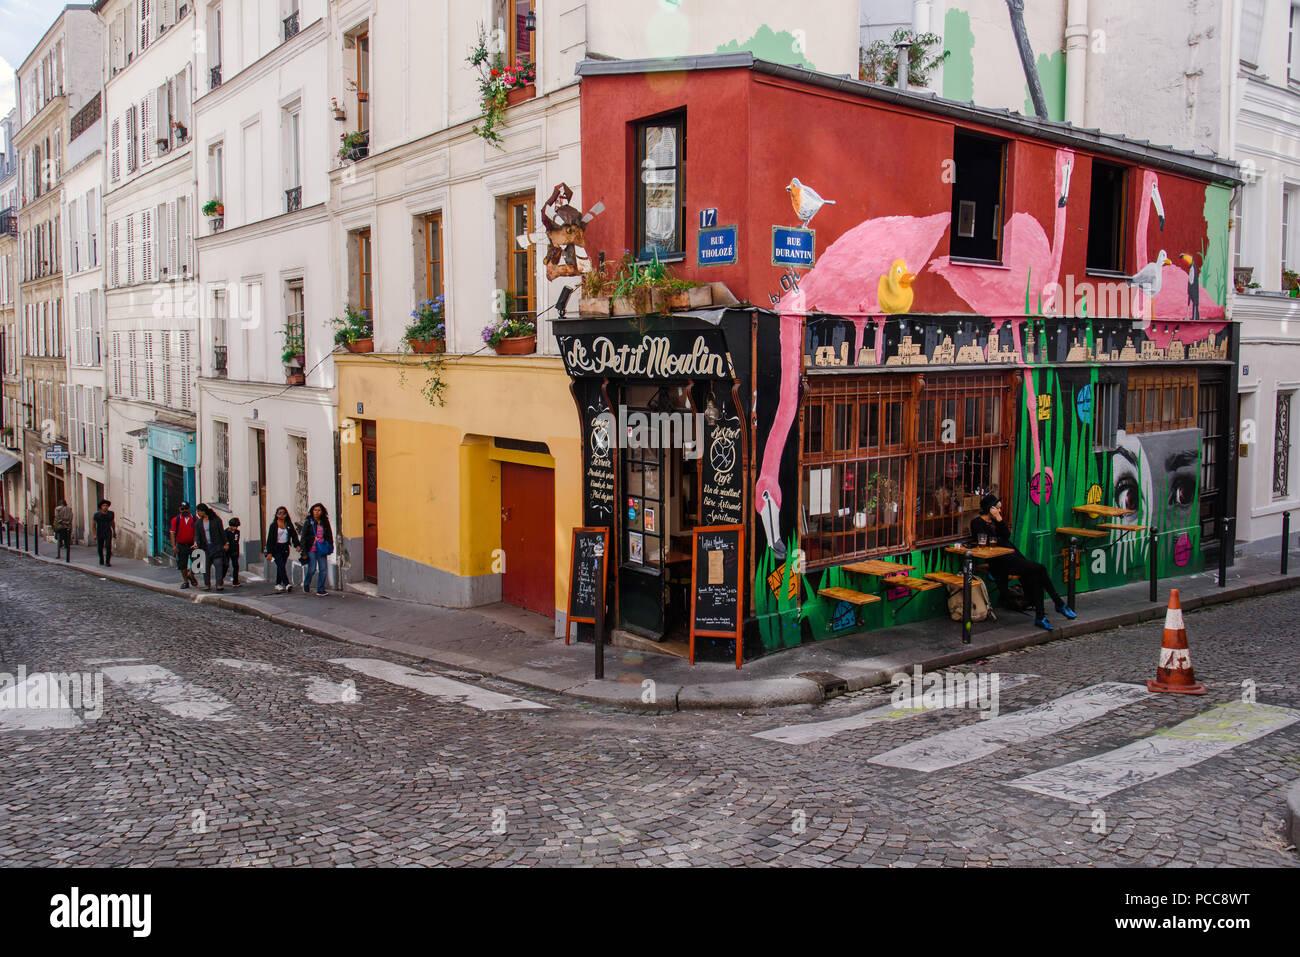 French Restaurant Le Relais Gascon Stock Photo